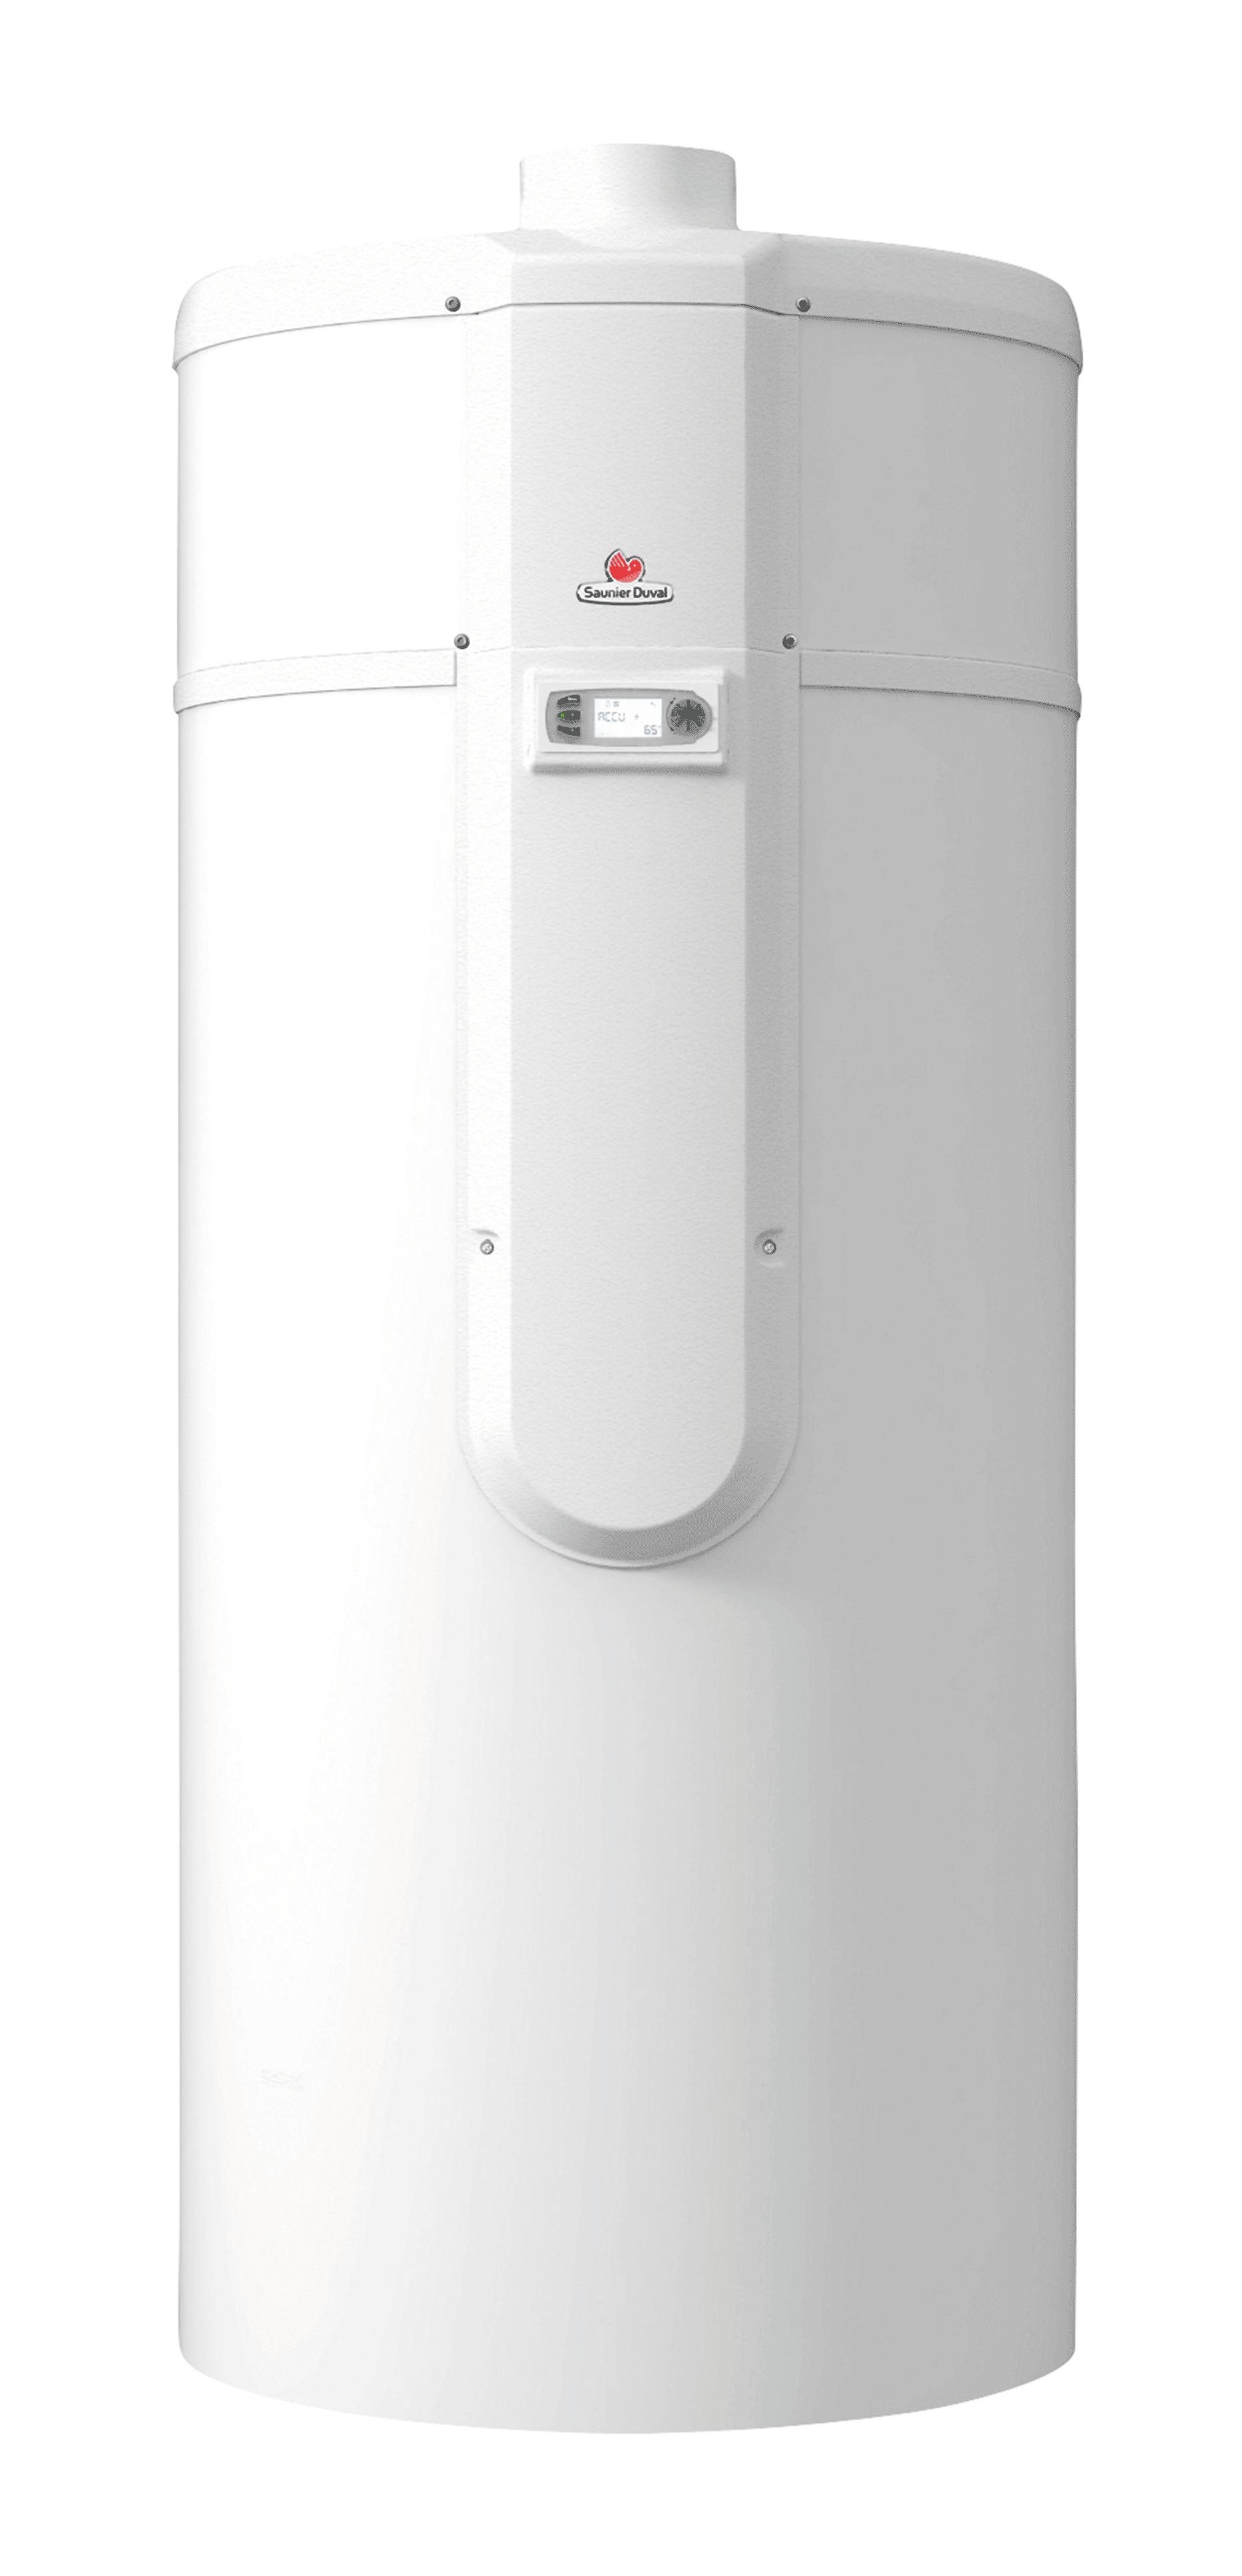 Magna aqua bomba de calor de alto rendimiento bajo - Bomba de calor consumo ...